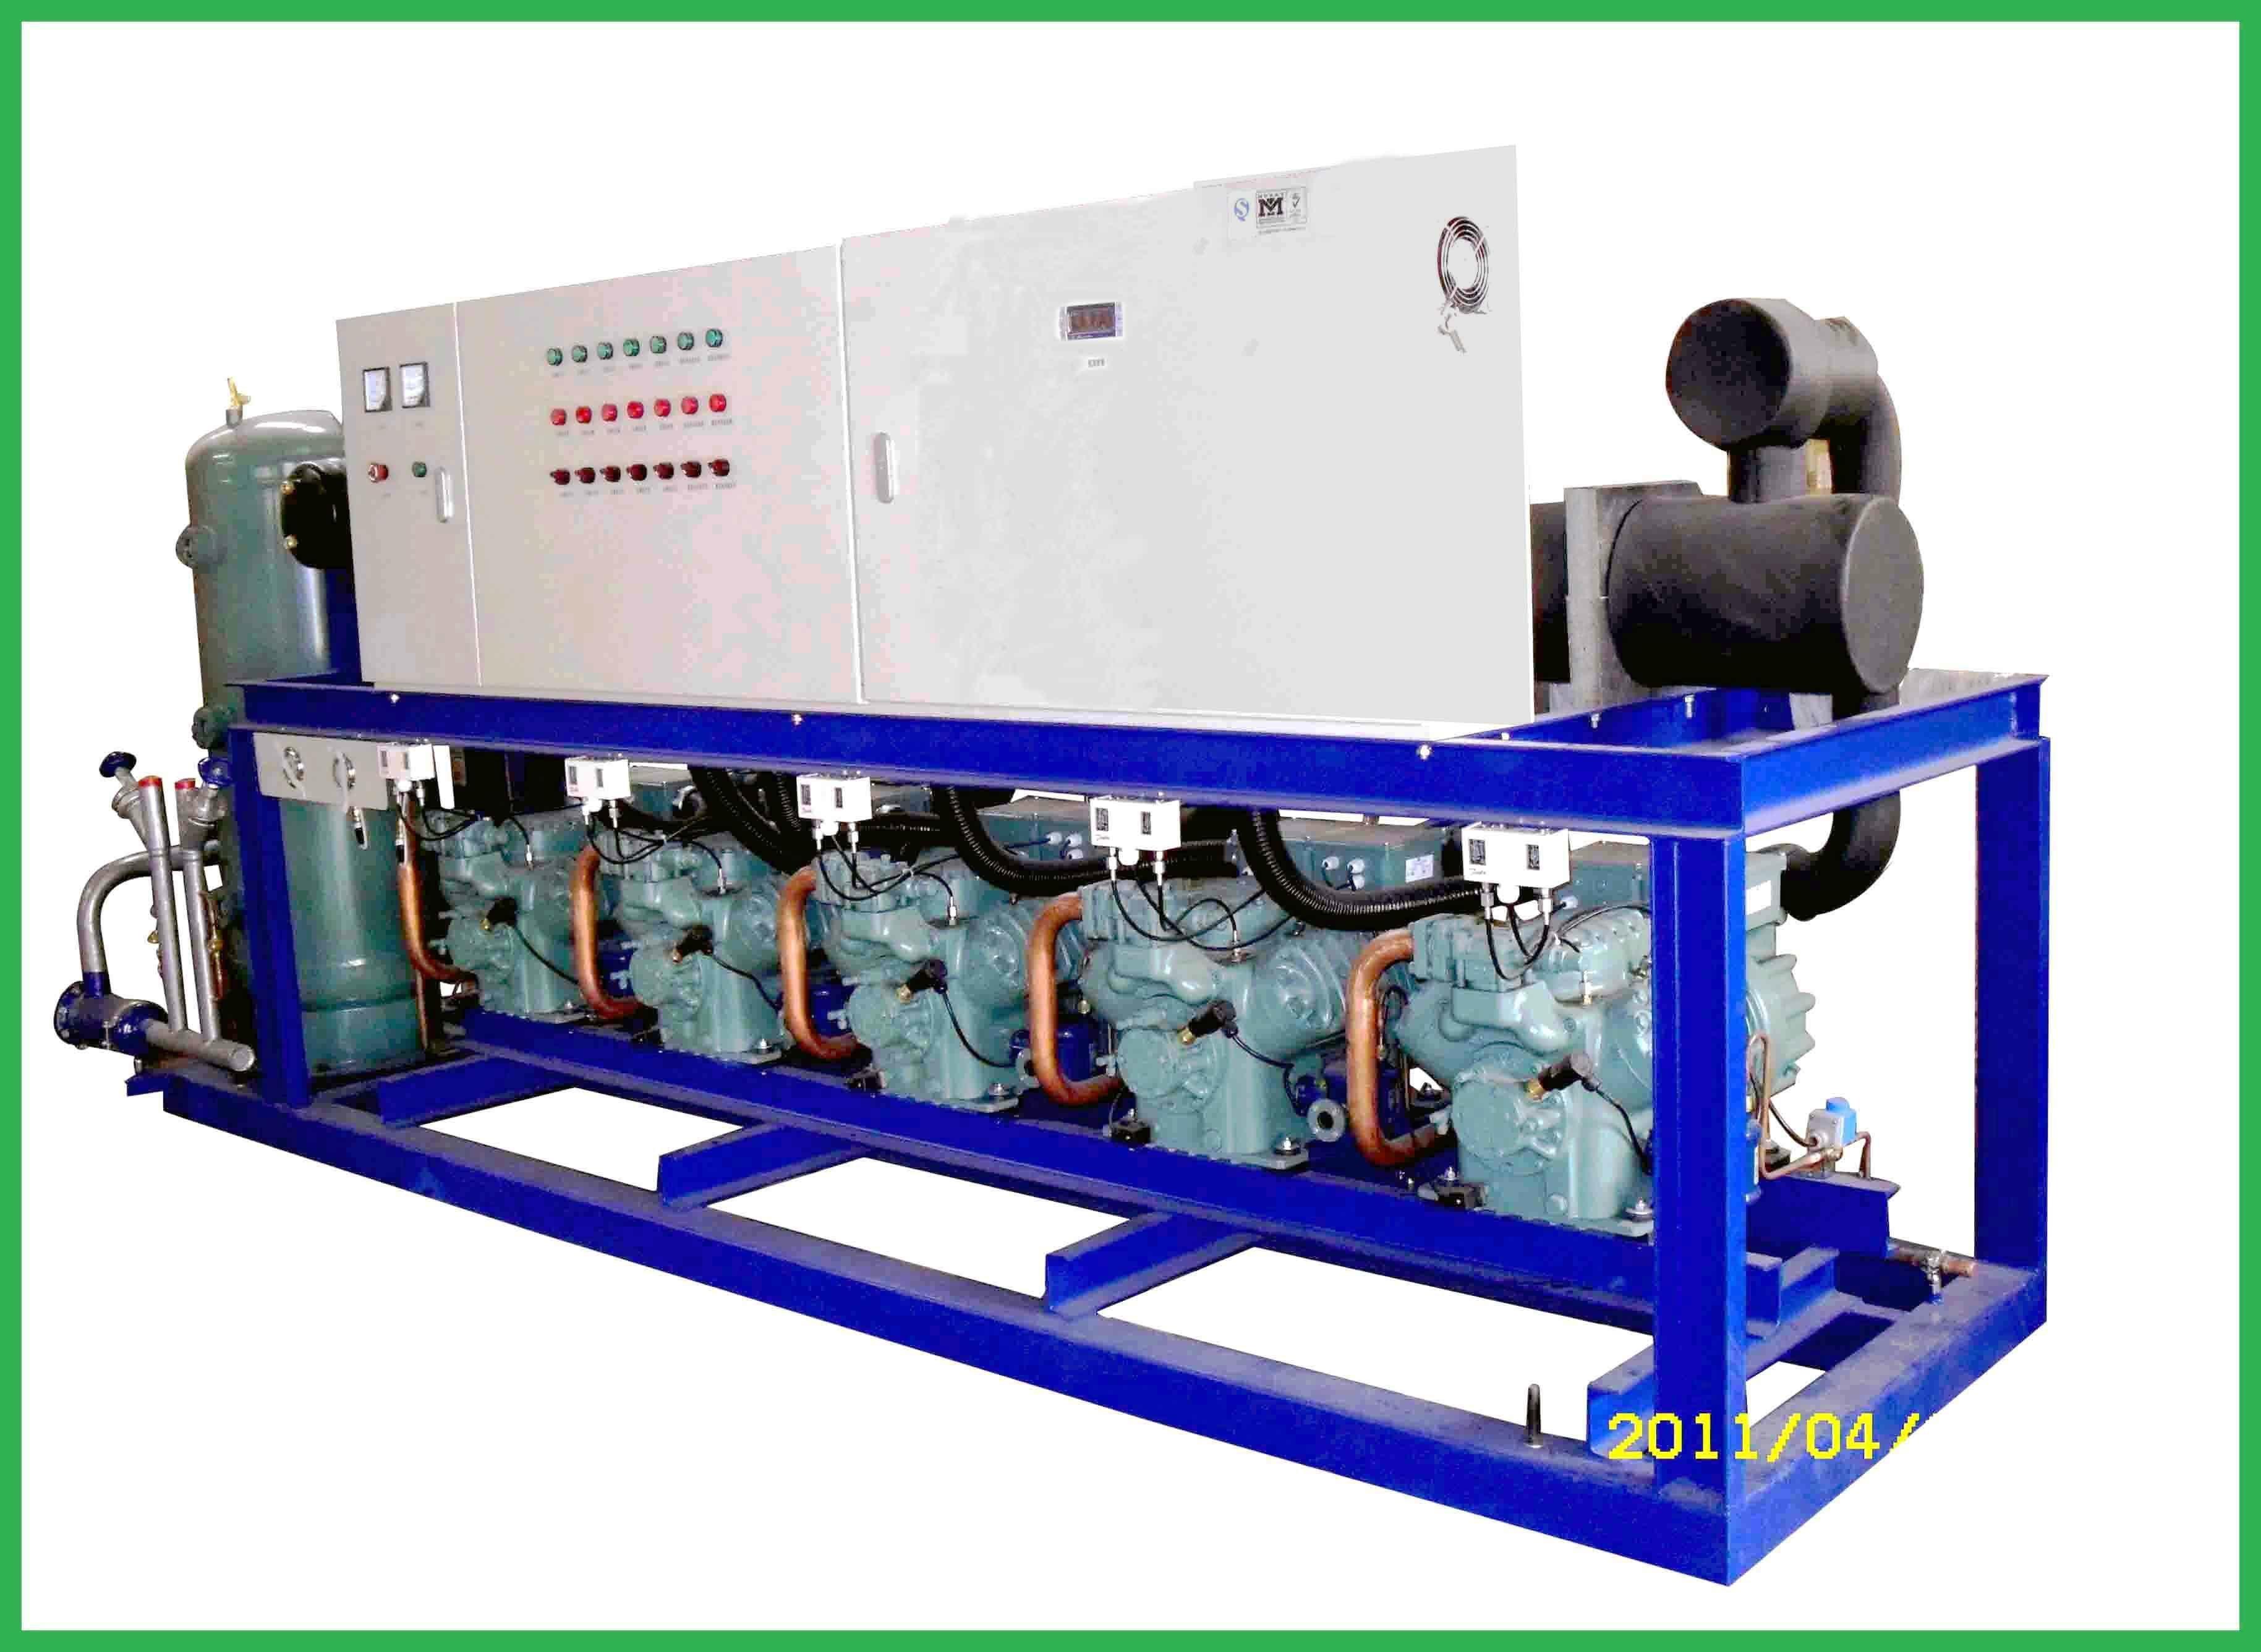 Winteco Ice Hotel Room Air Coolers : Piston compressor unit spbh photos pictures